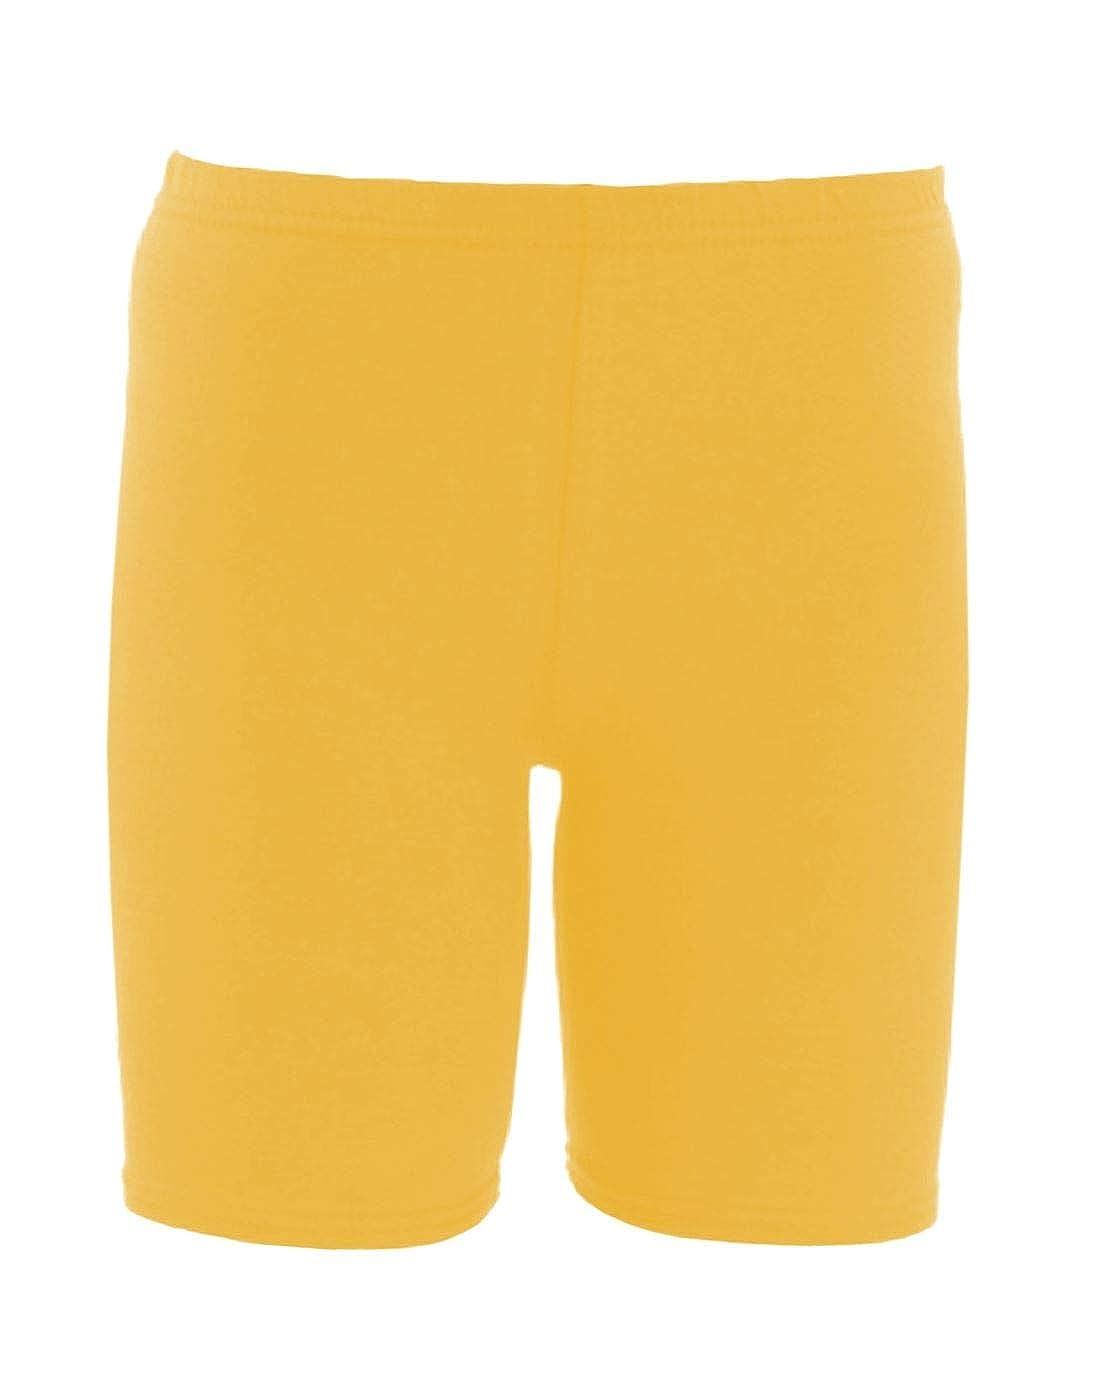 janisramone Girls Kids New Plain Stretchy Dance Gymnastics Sports PE School Game Summer Cycling Shorts Pants